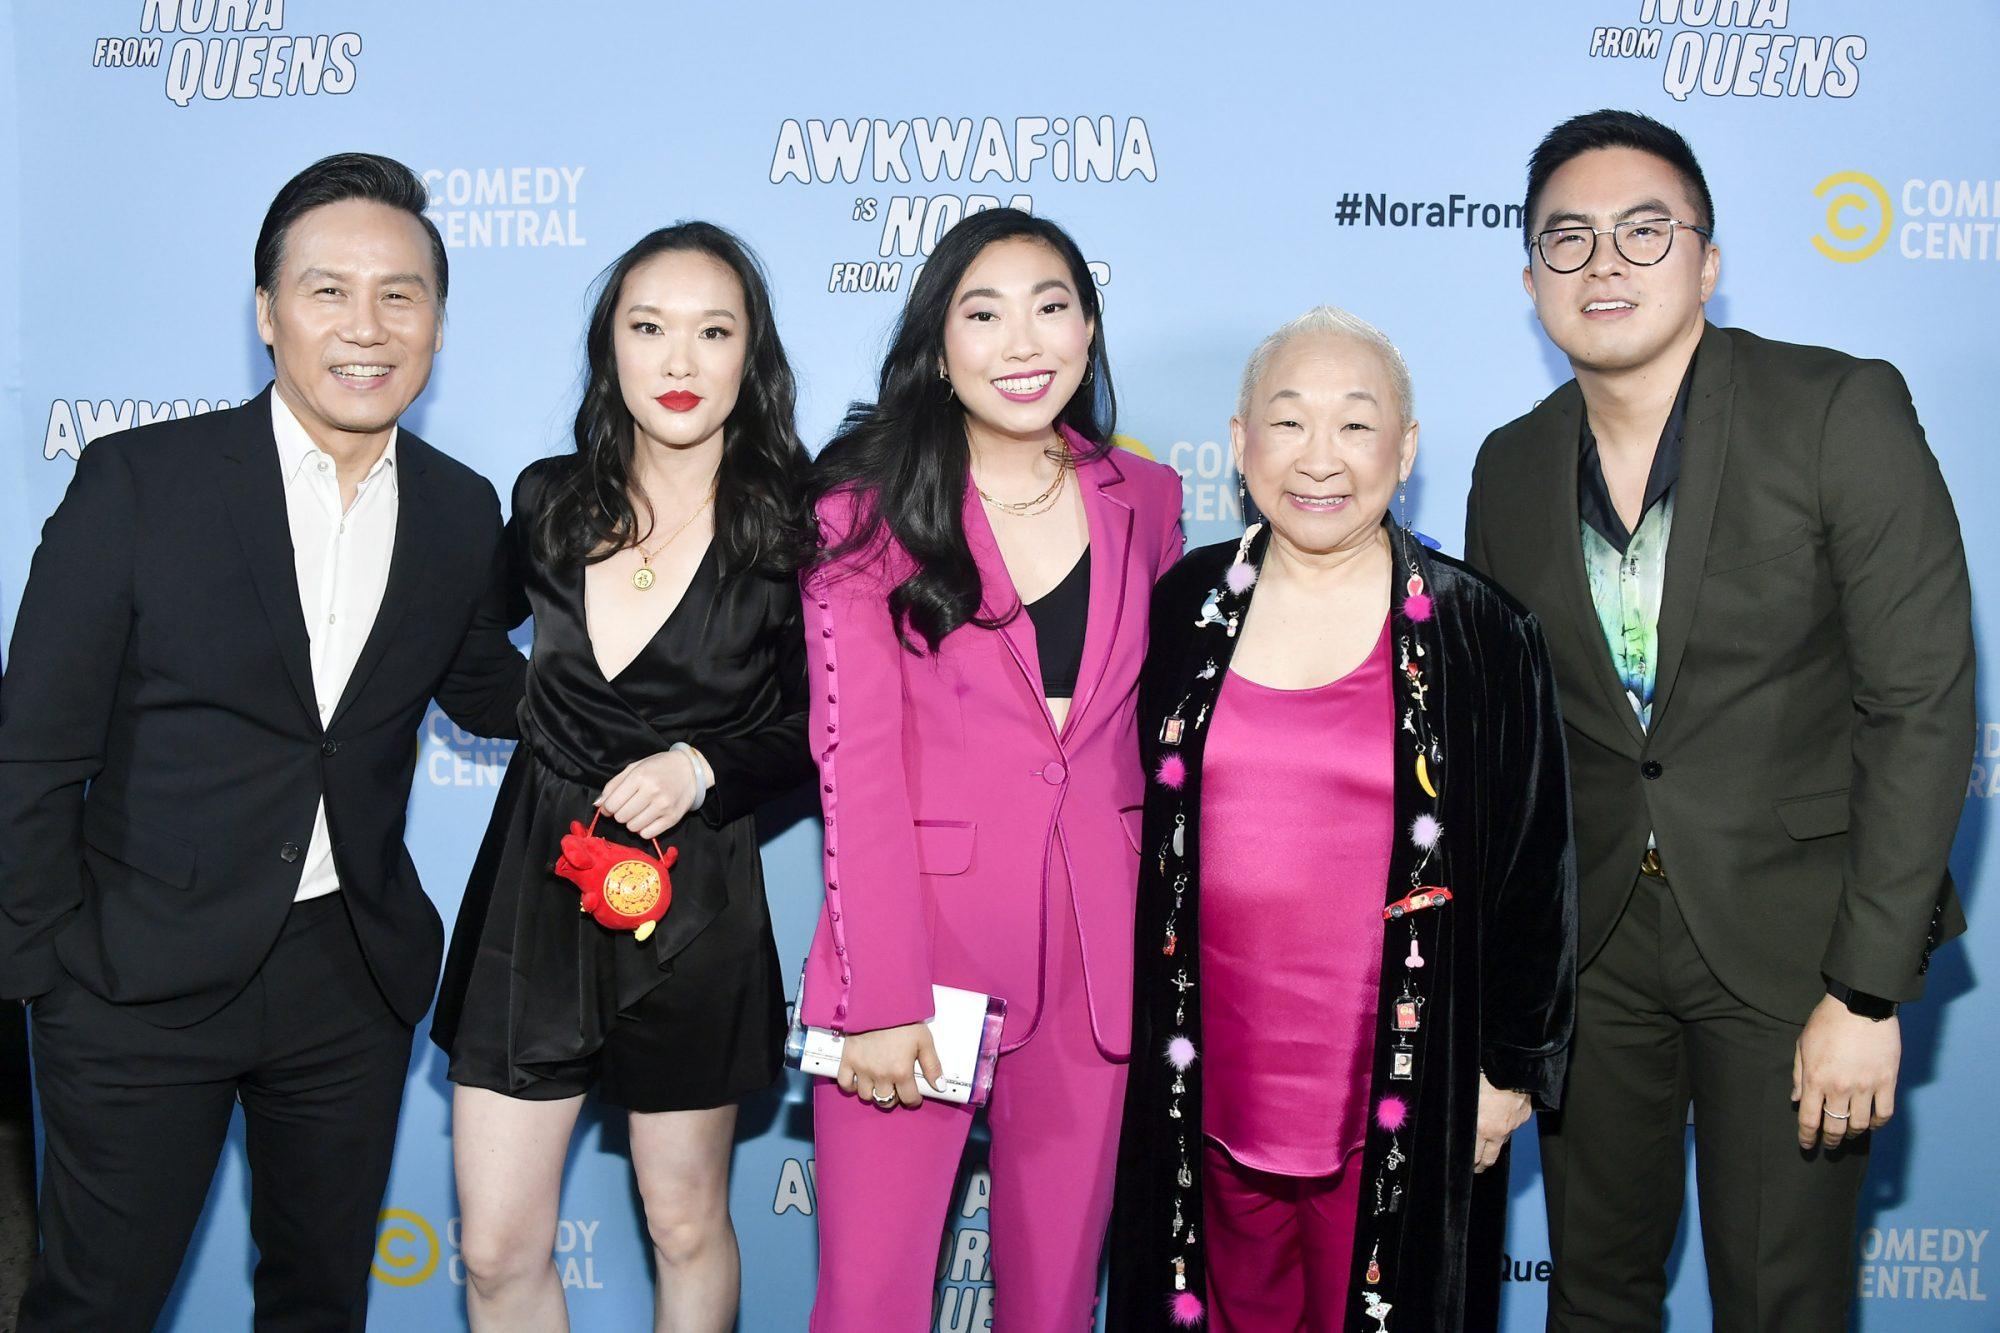 BD Wong, Teresa Hsiao, Awkwafina, Lori Tan Chinn, and Bowen Yang